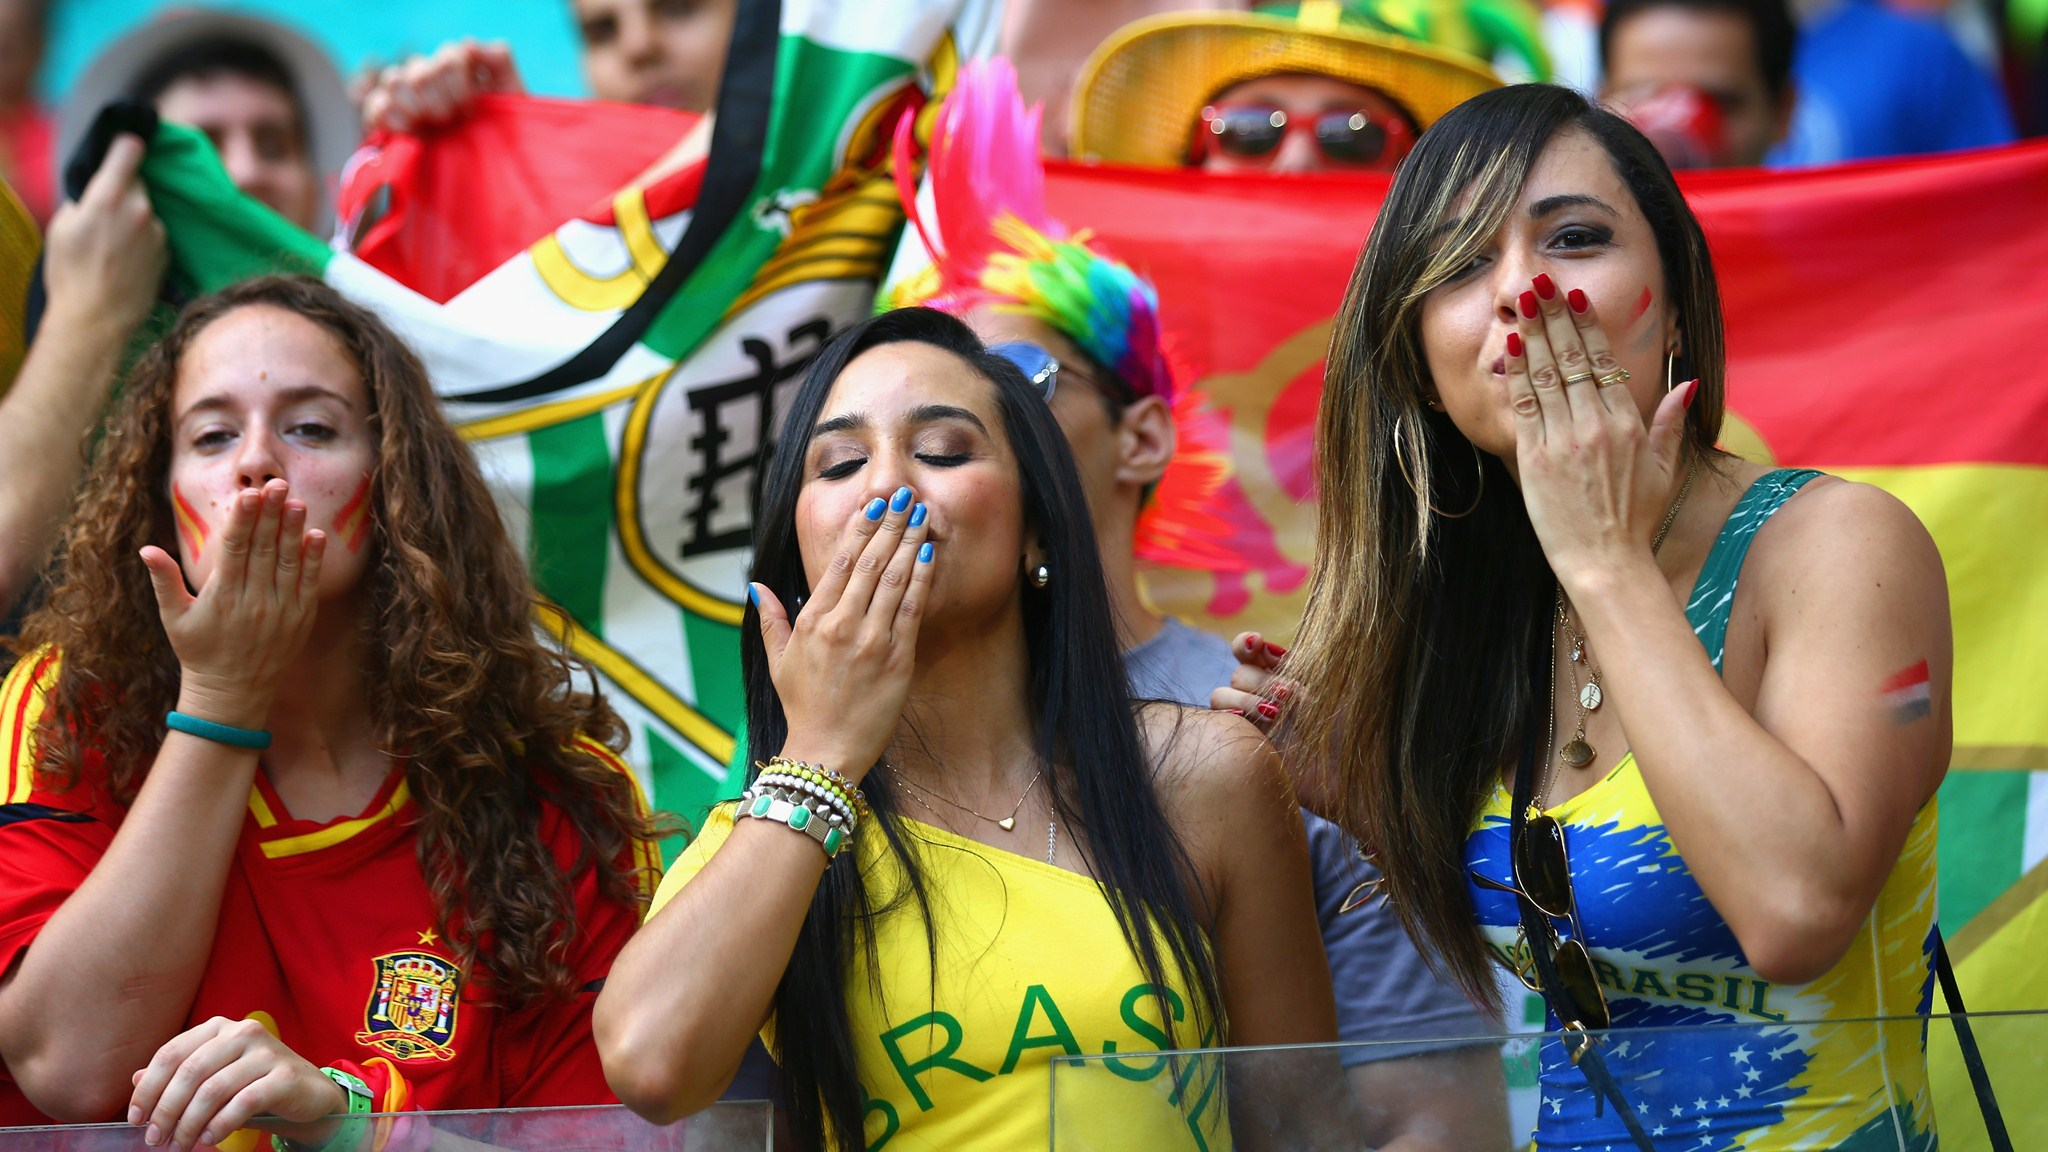 156 - Spain-Netherlands [1-5] -- 13 Jun 2014 - 16-00 -- Salvador - Arena Fonte Nova - kuaza